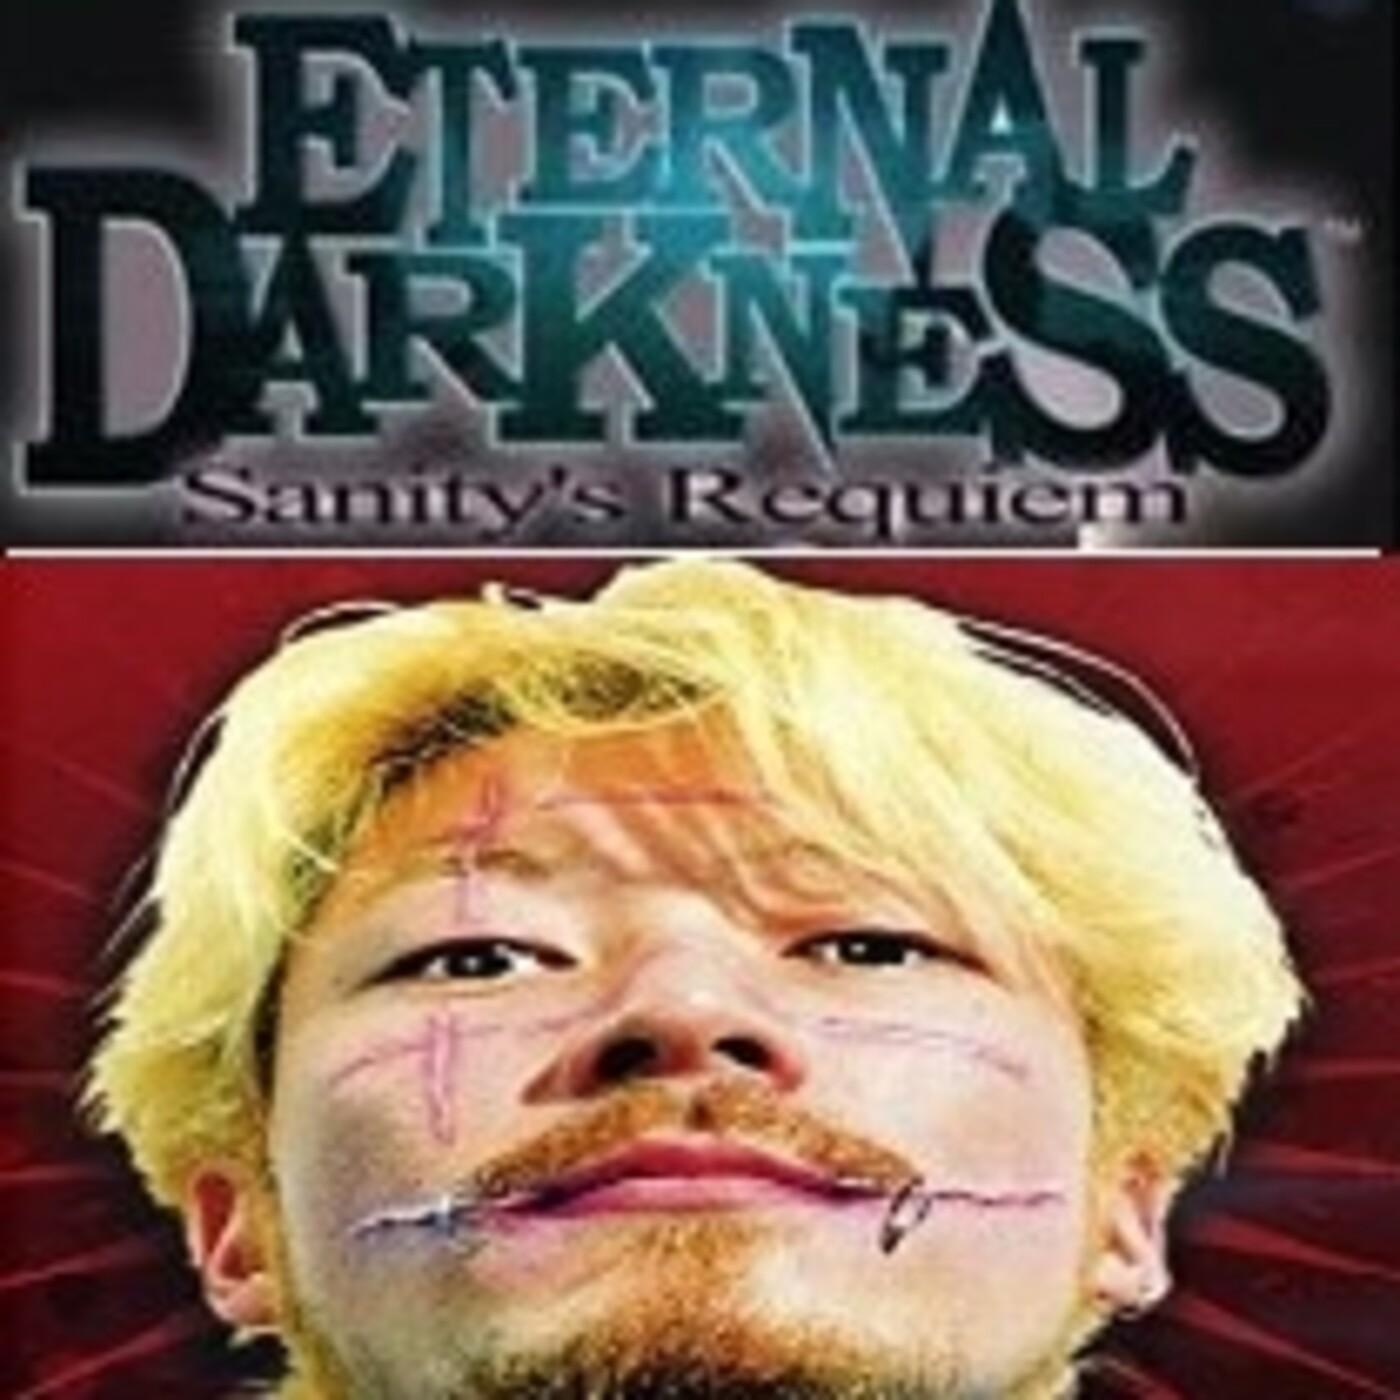 Space Paranoids 1x06 Eternal Darkness & Ichi the Killer